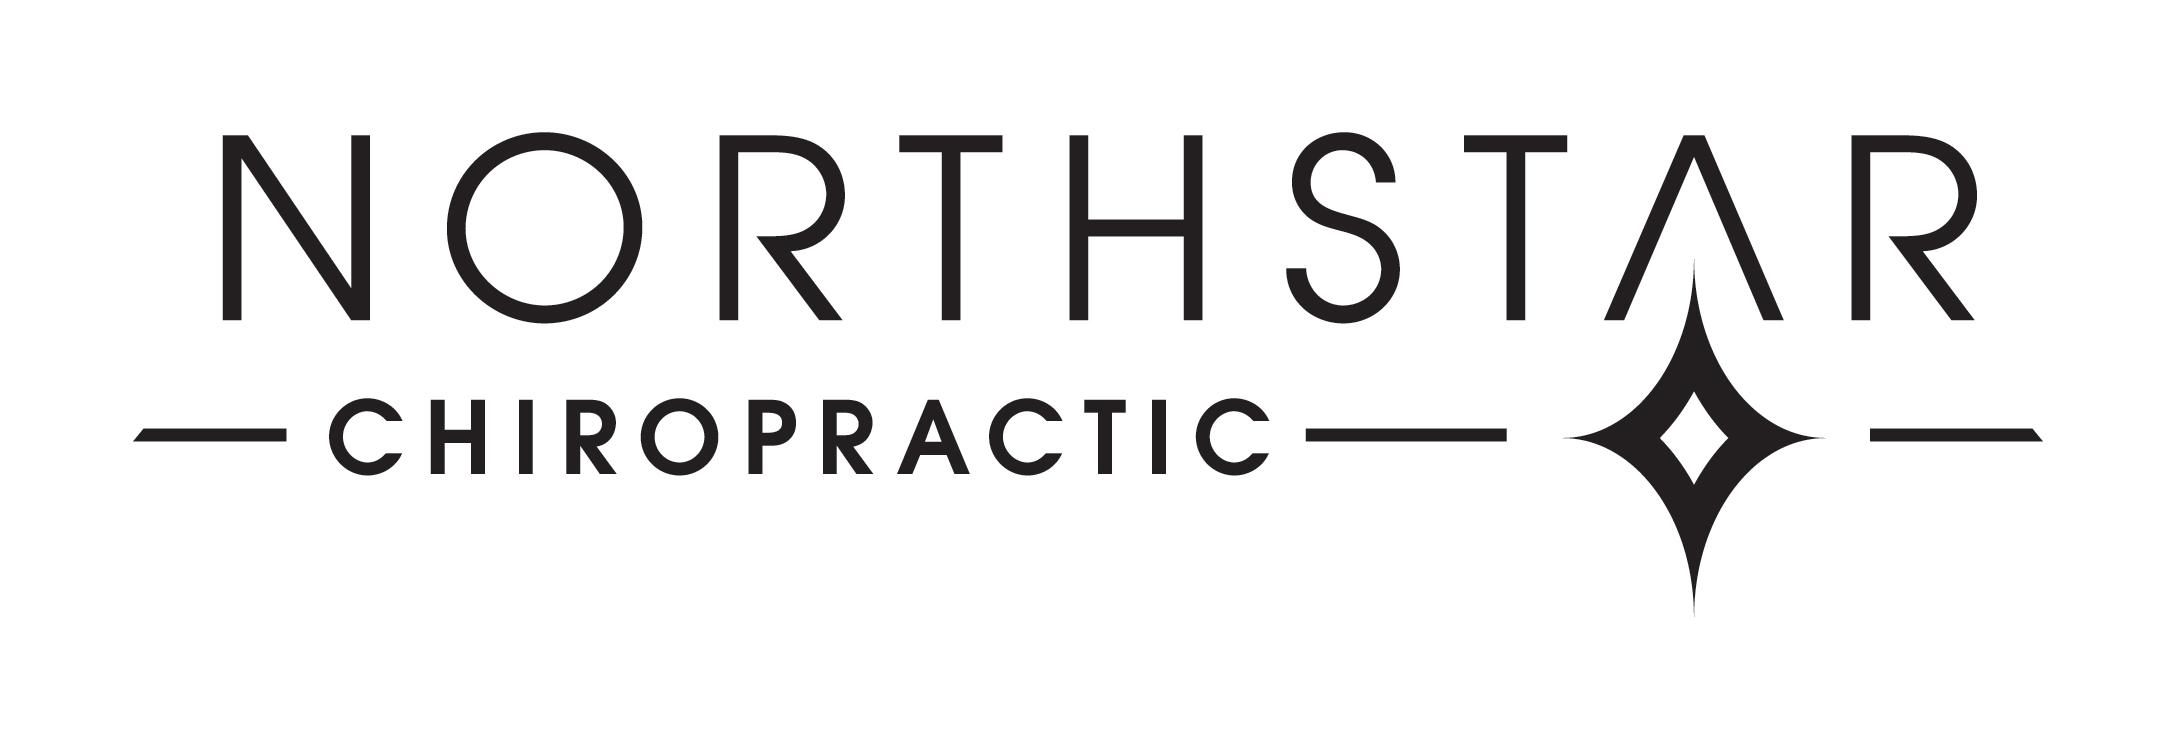 NorthStar Chiropractic - Ludington Michigan